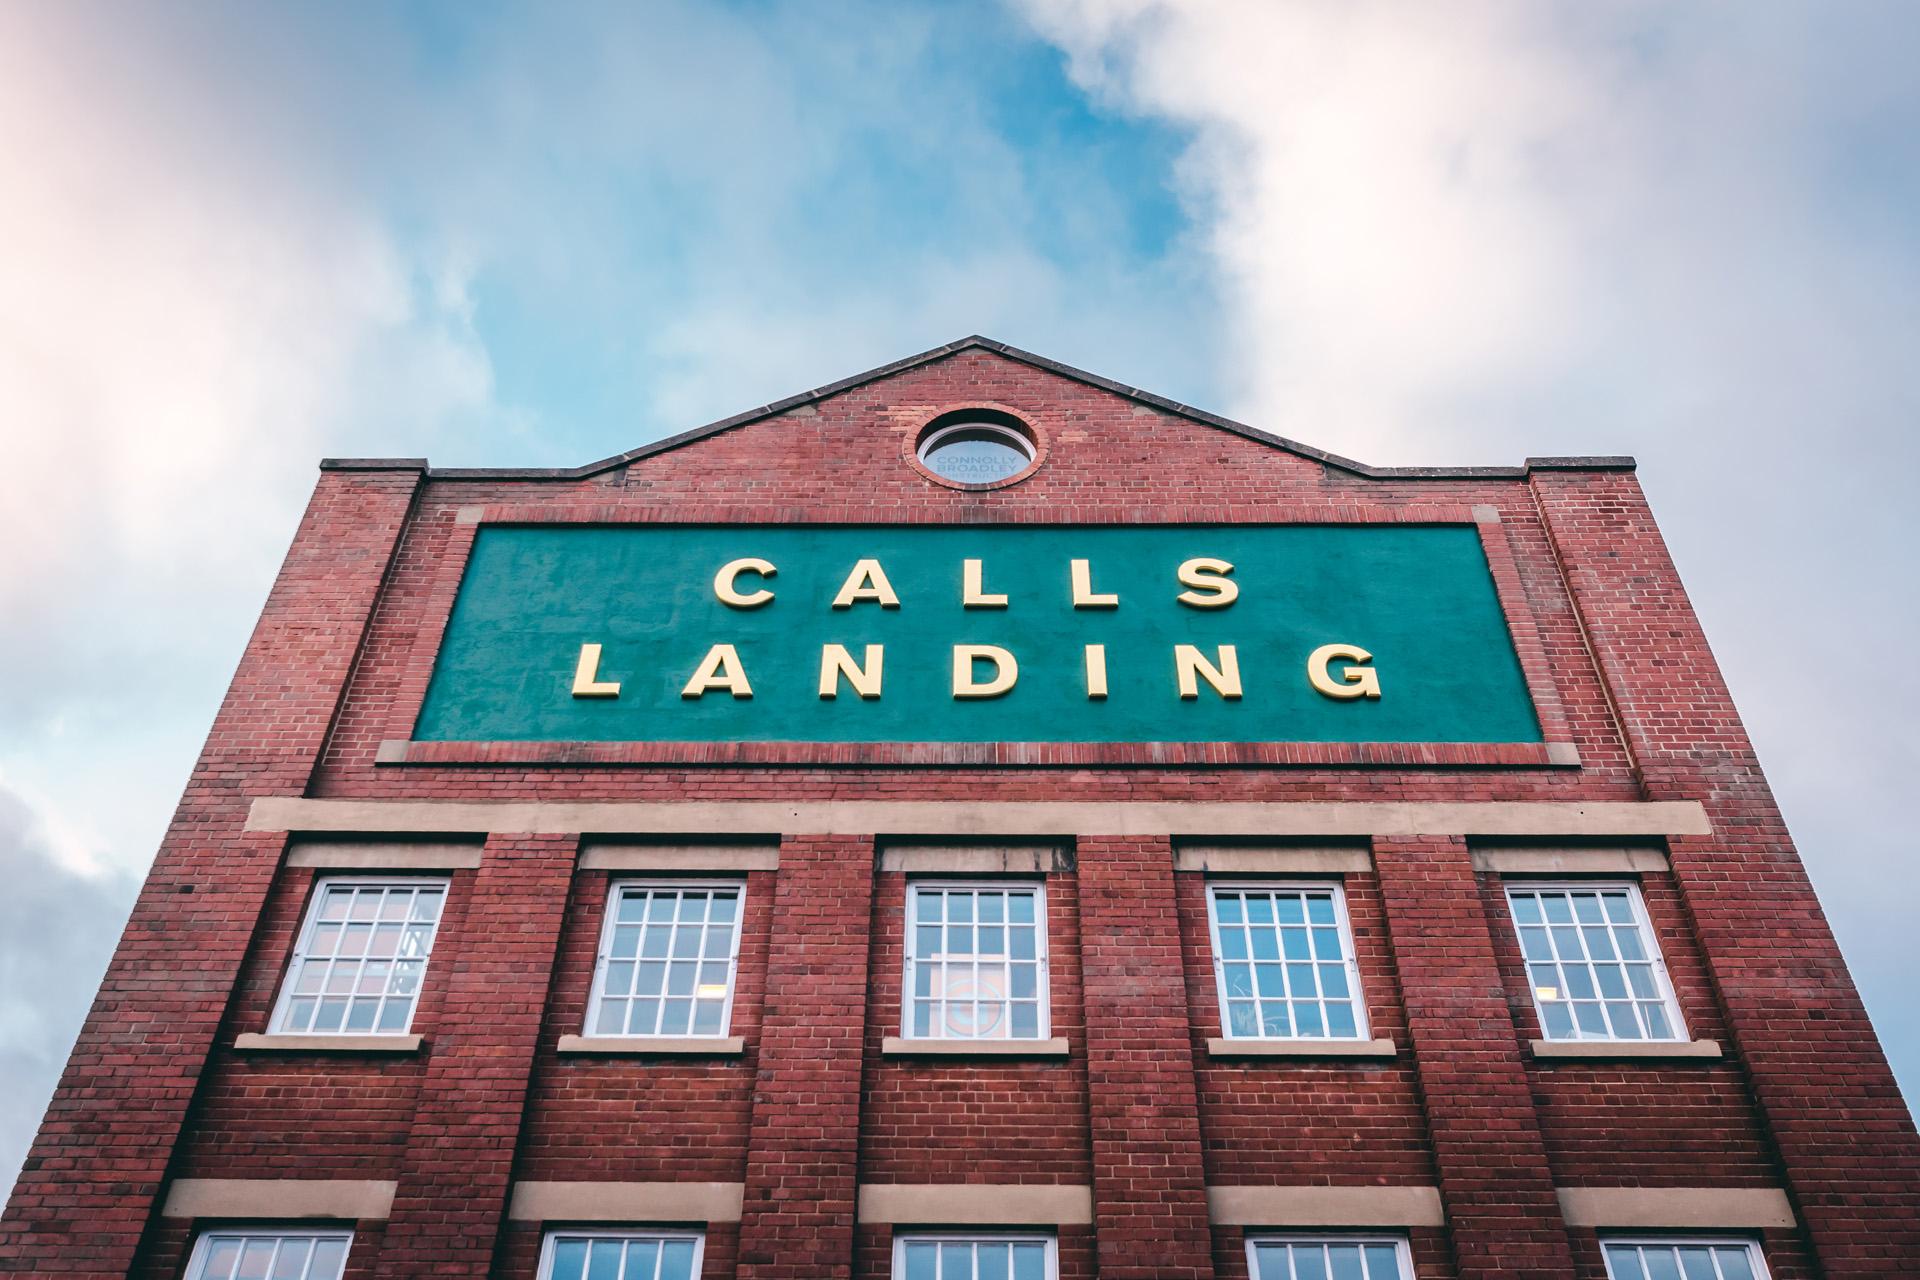 Calls-Landing-12-14-17.jpg